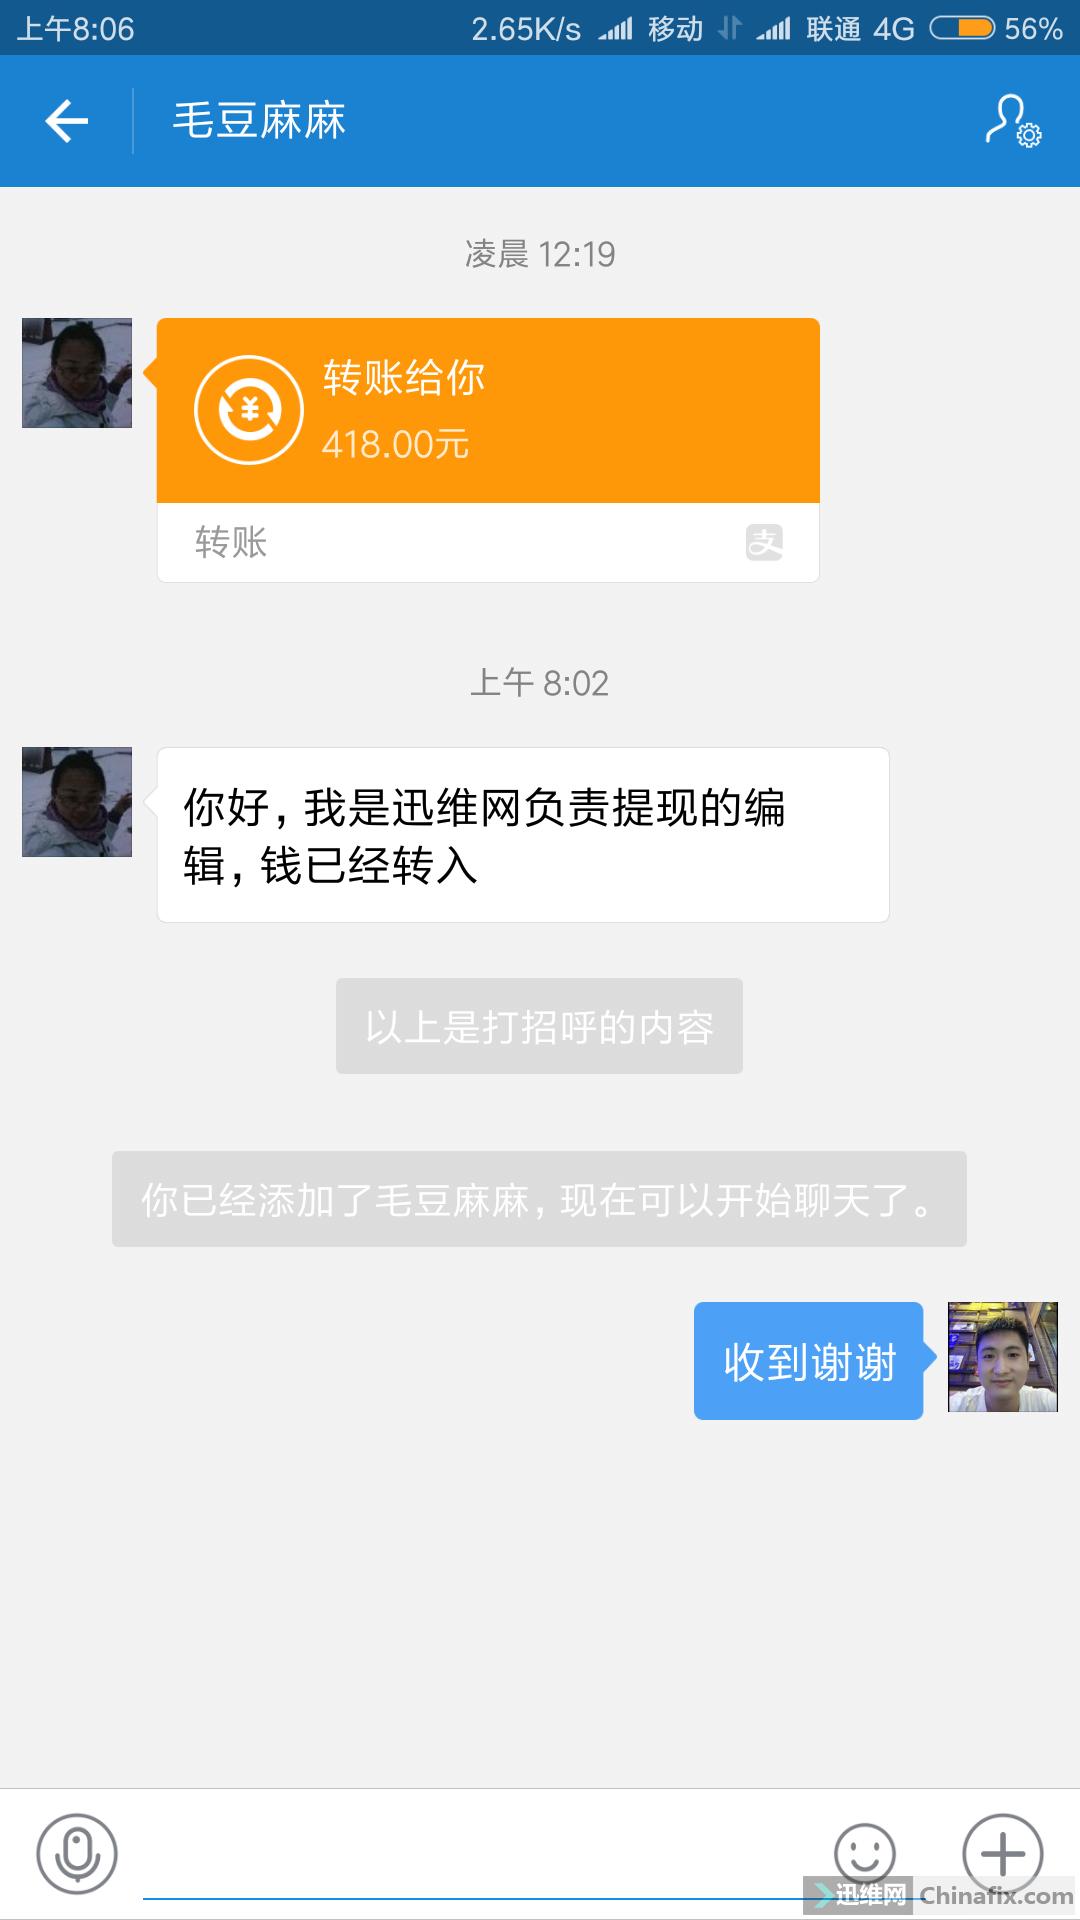 Screenshot_2017-07-12-08-06-46-365_com.eg.android.png